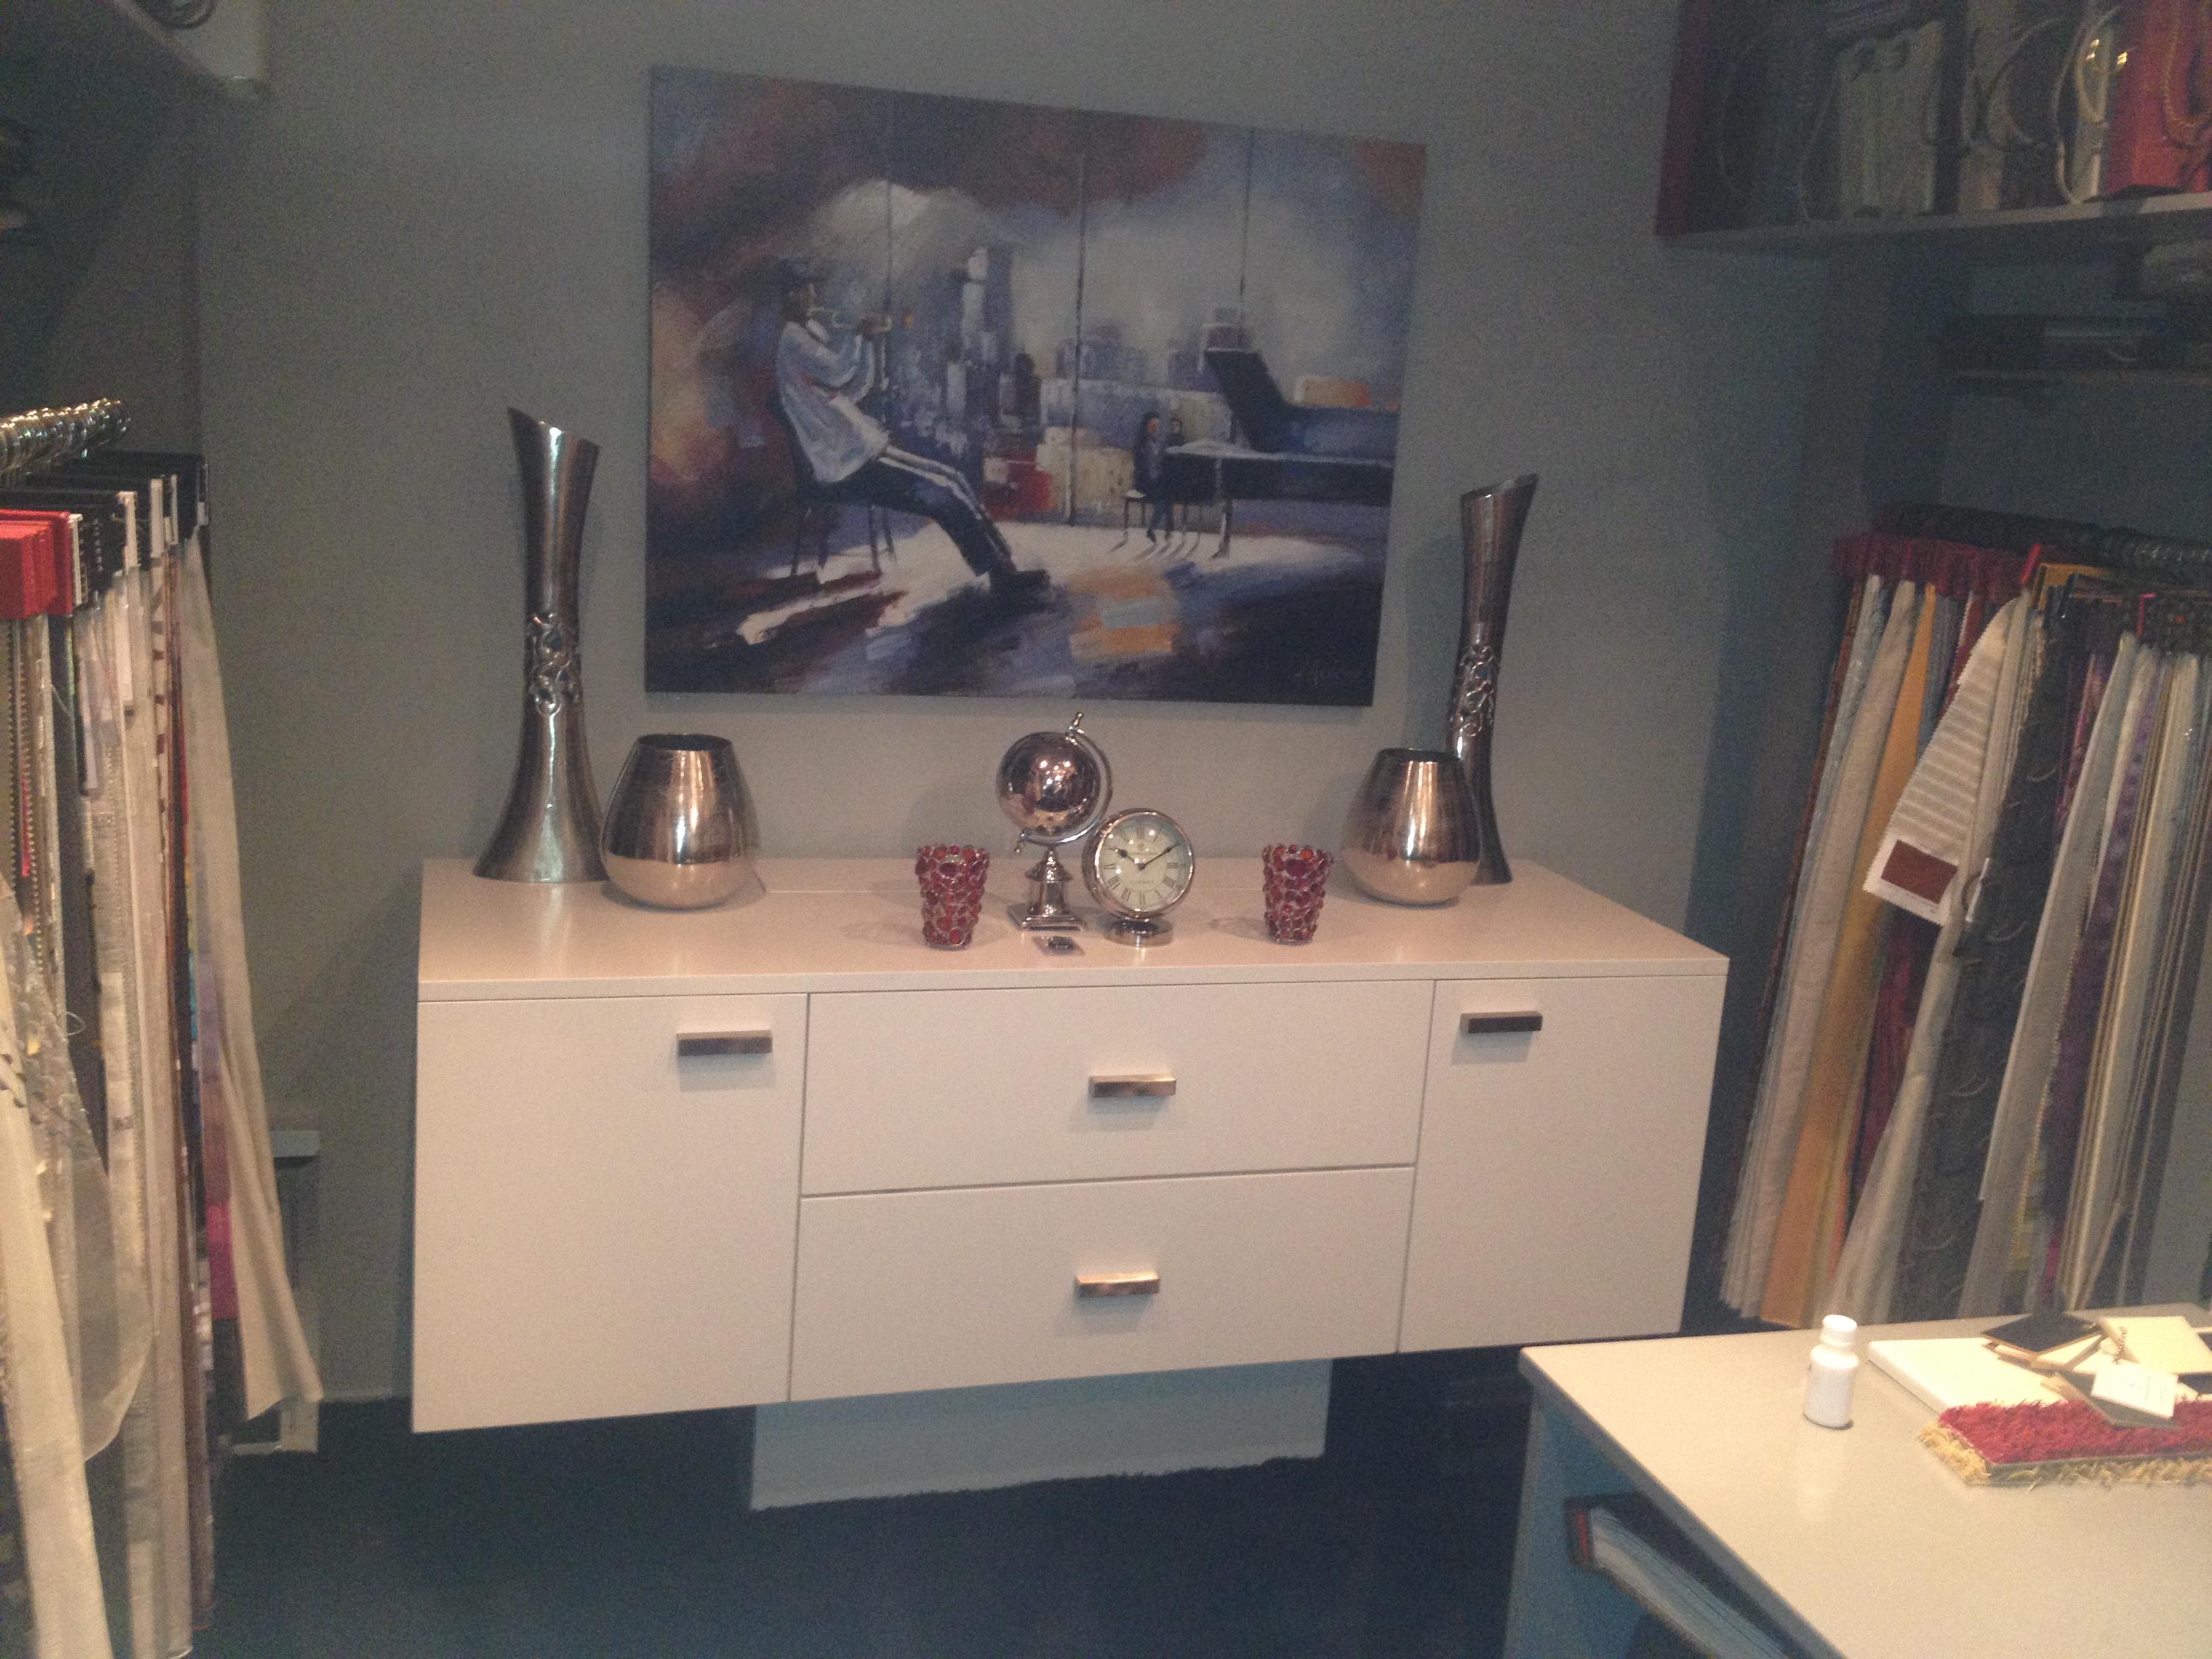 Aparte Tv Meubels : Tv meubel met lift fabriekmeubels